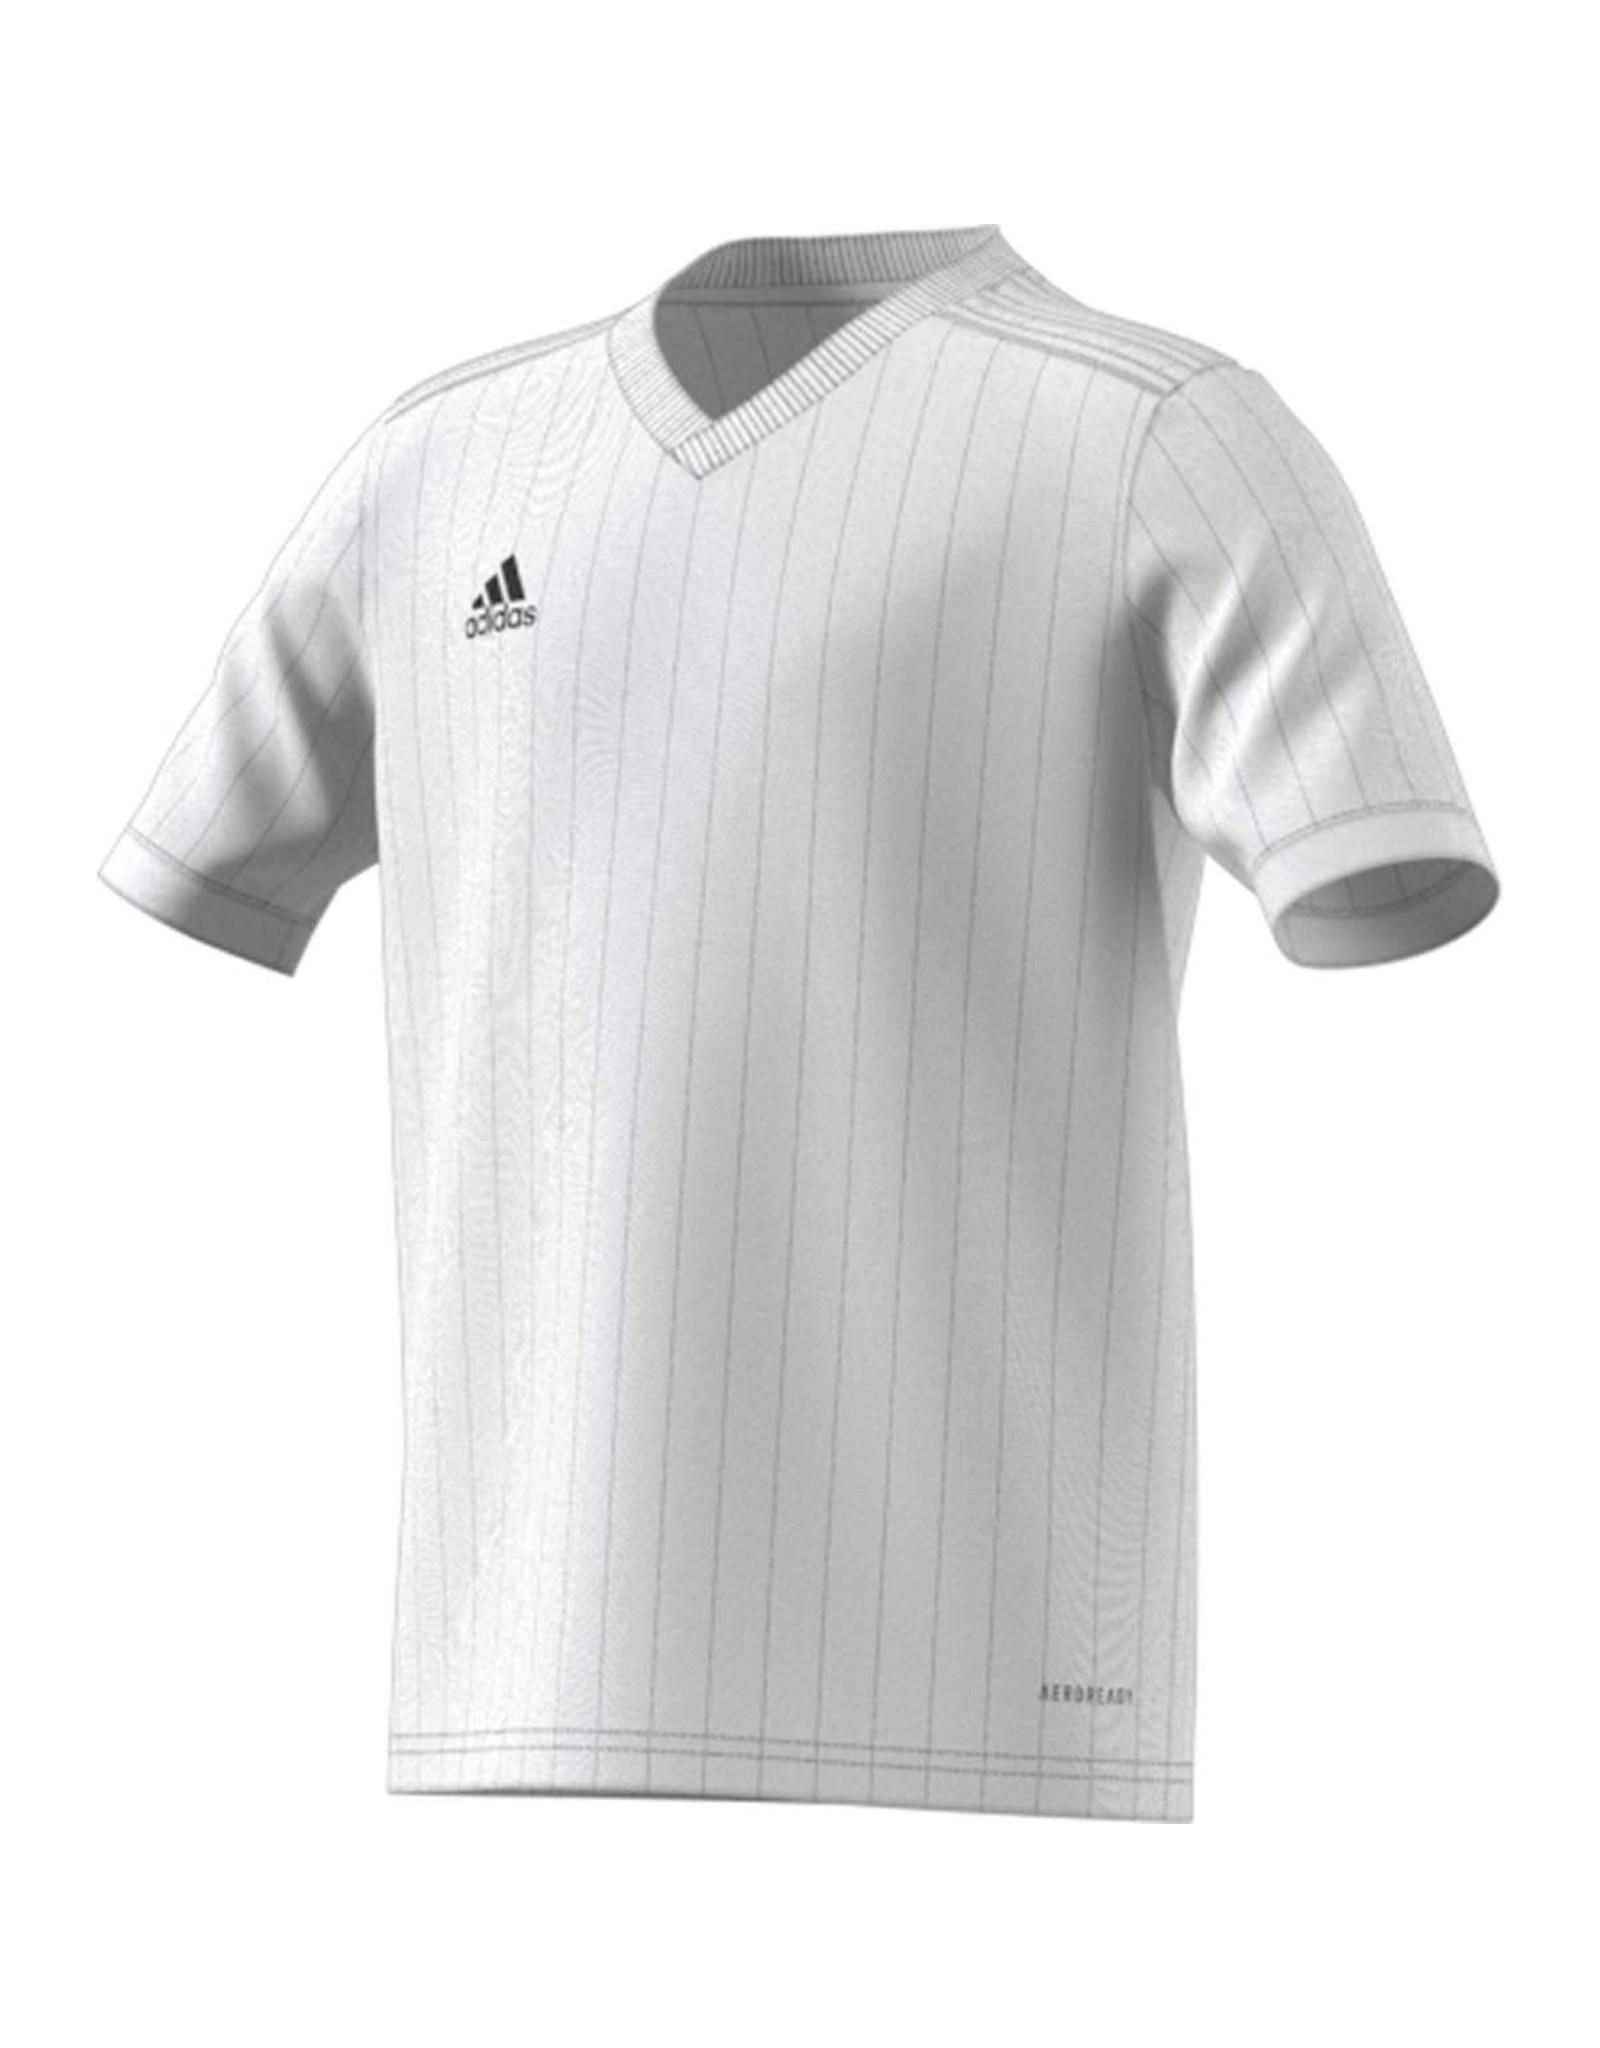 Adidas ADIDAS  CFC ALTERNATE GAME JSY